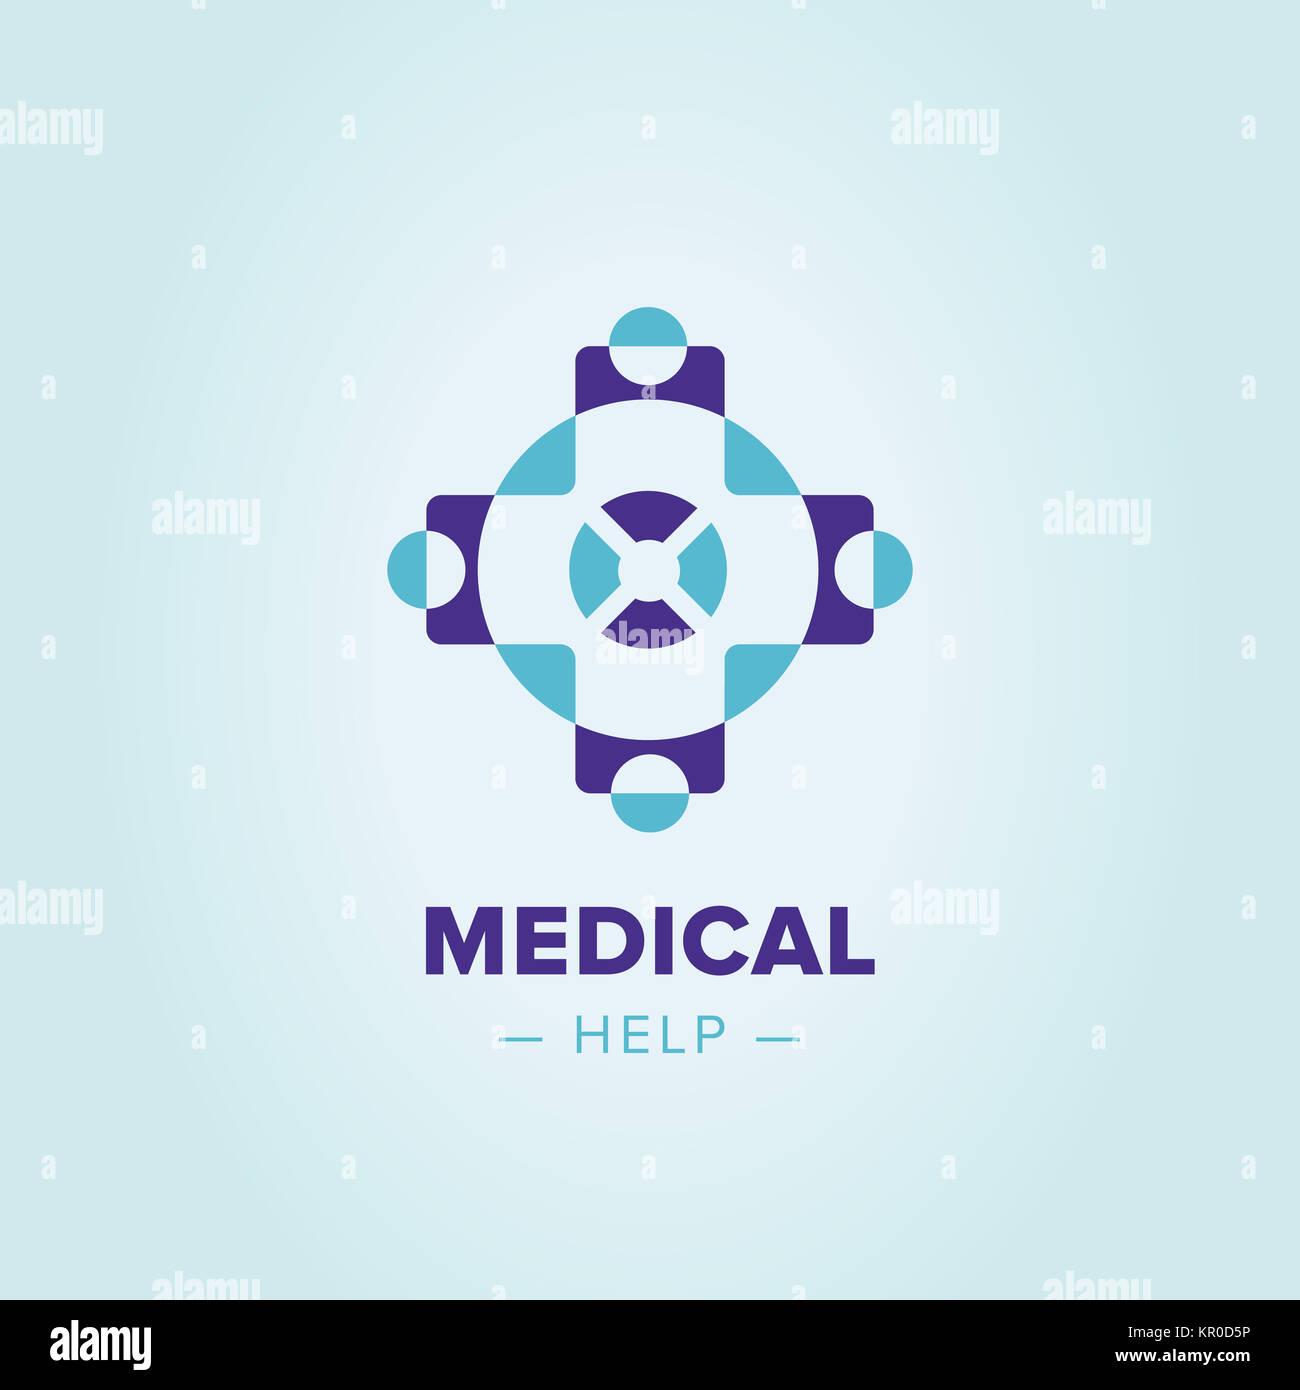 medic cross logo template stock photo 169040754 alamy